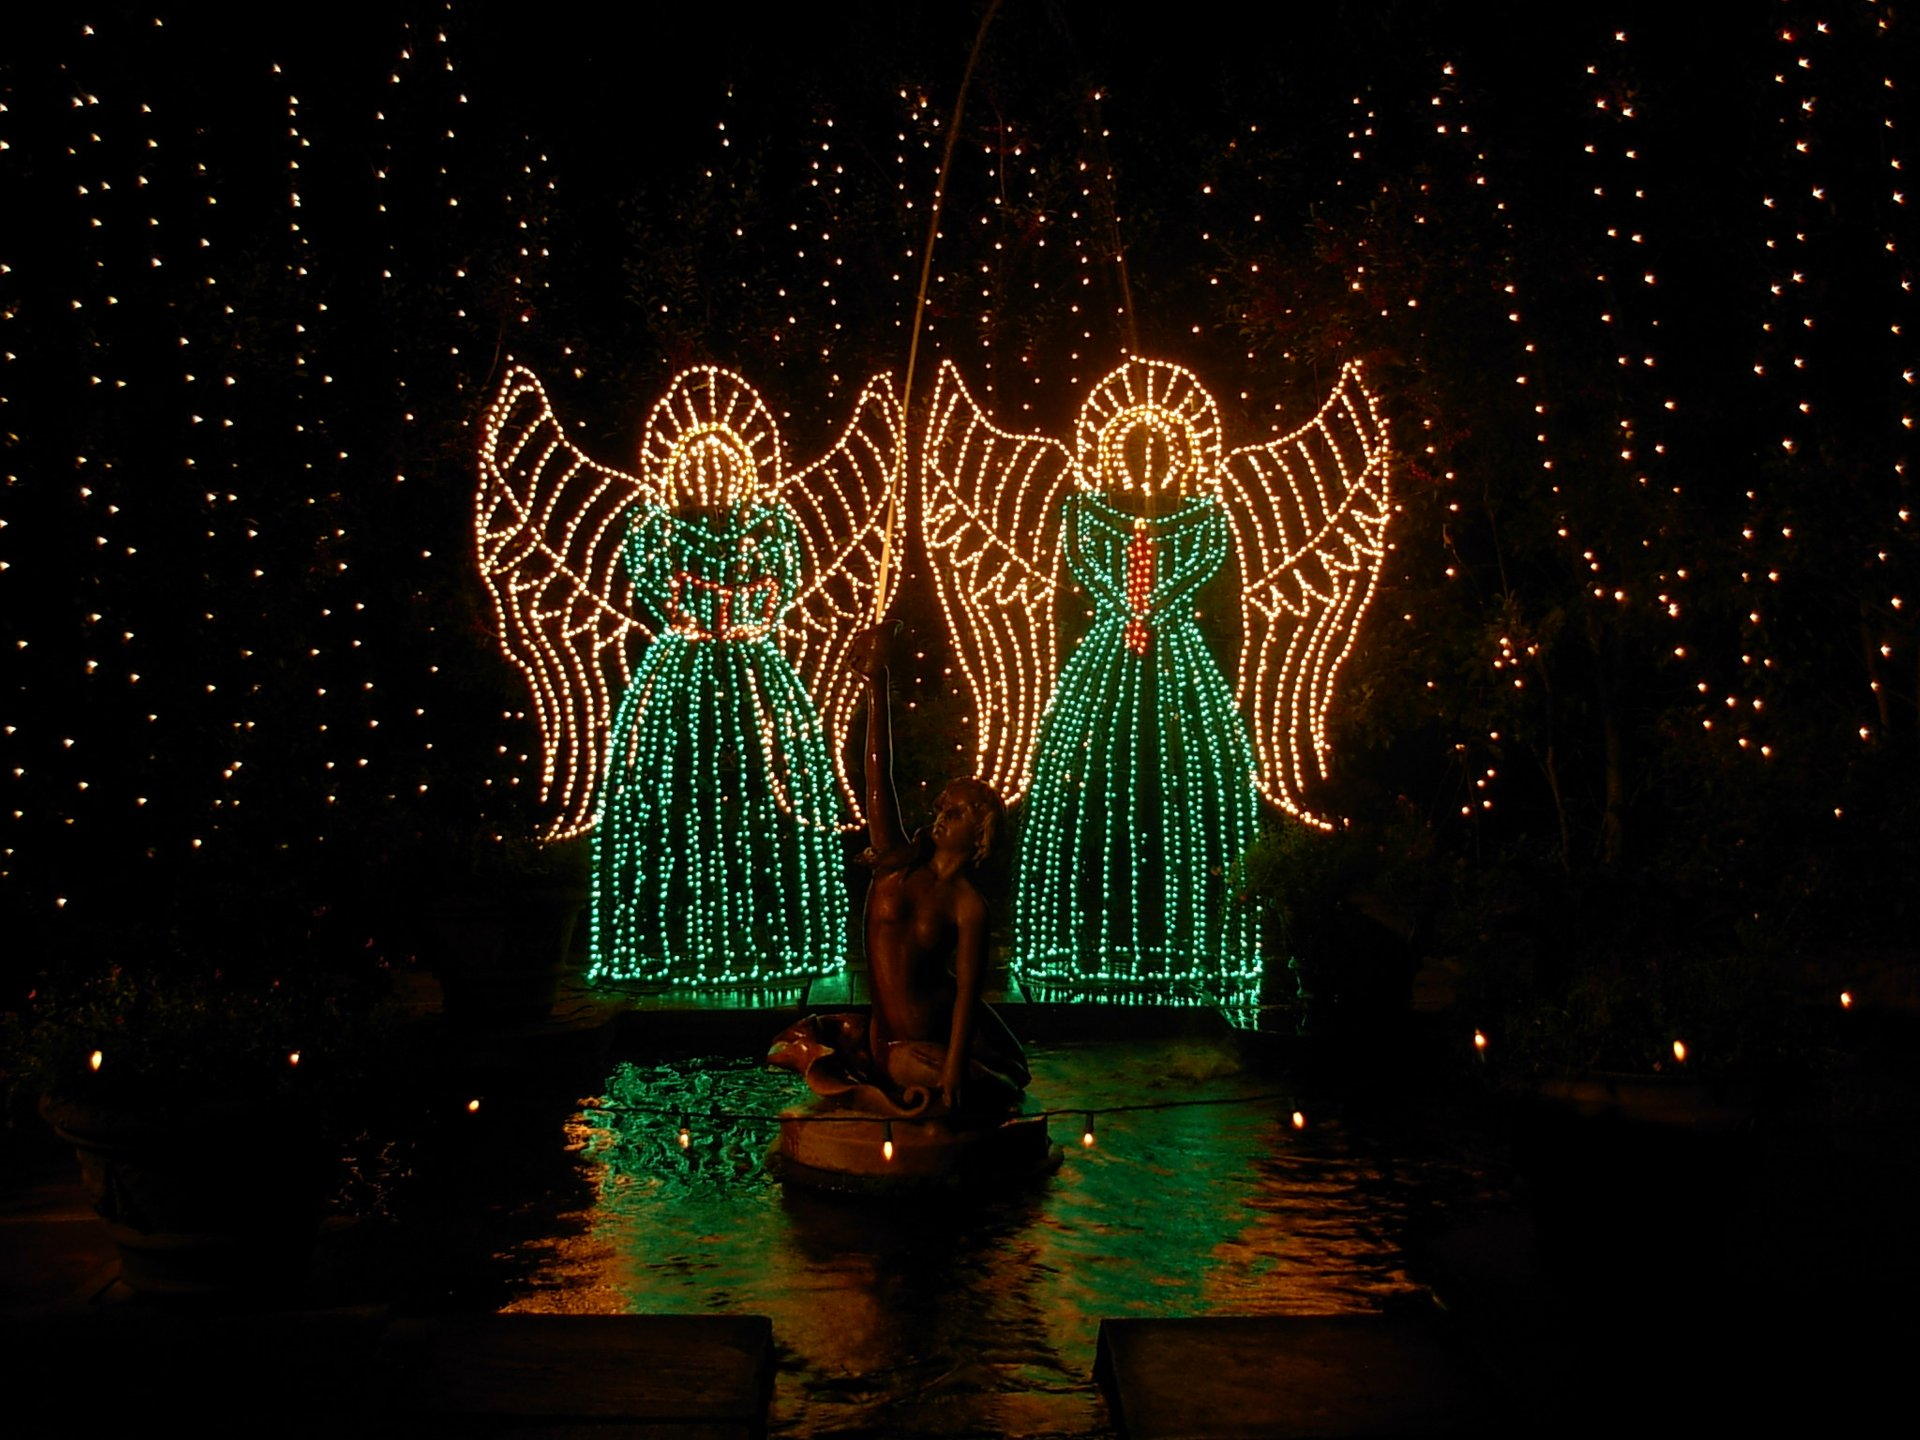 Bellingrath Magic Christmas in Lights 2020